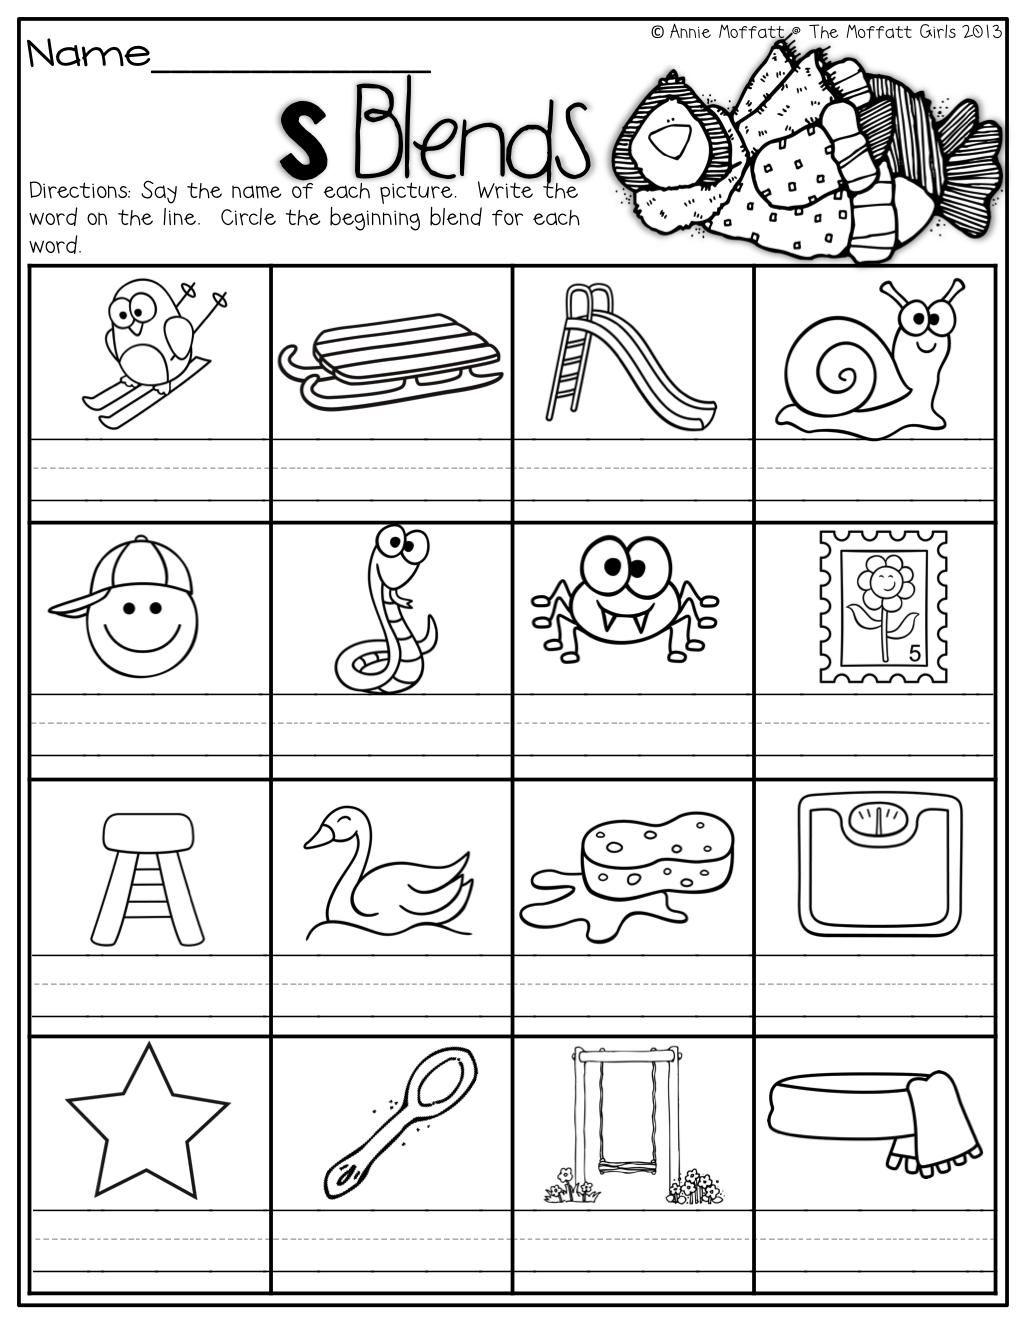 Free Printable Blending Sounds Worksheets In 2020 Blends Worksheets Phonics Blends Phonics Kindergarten [ 1325 x 1024 Pixel ]